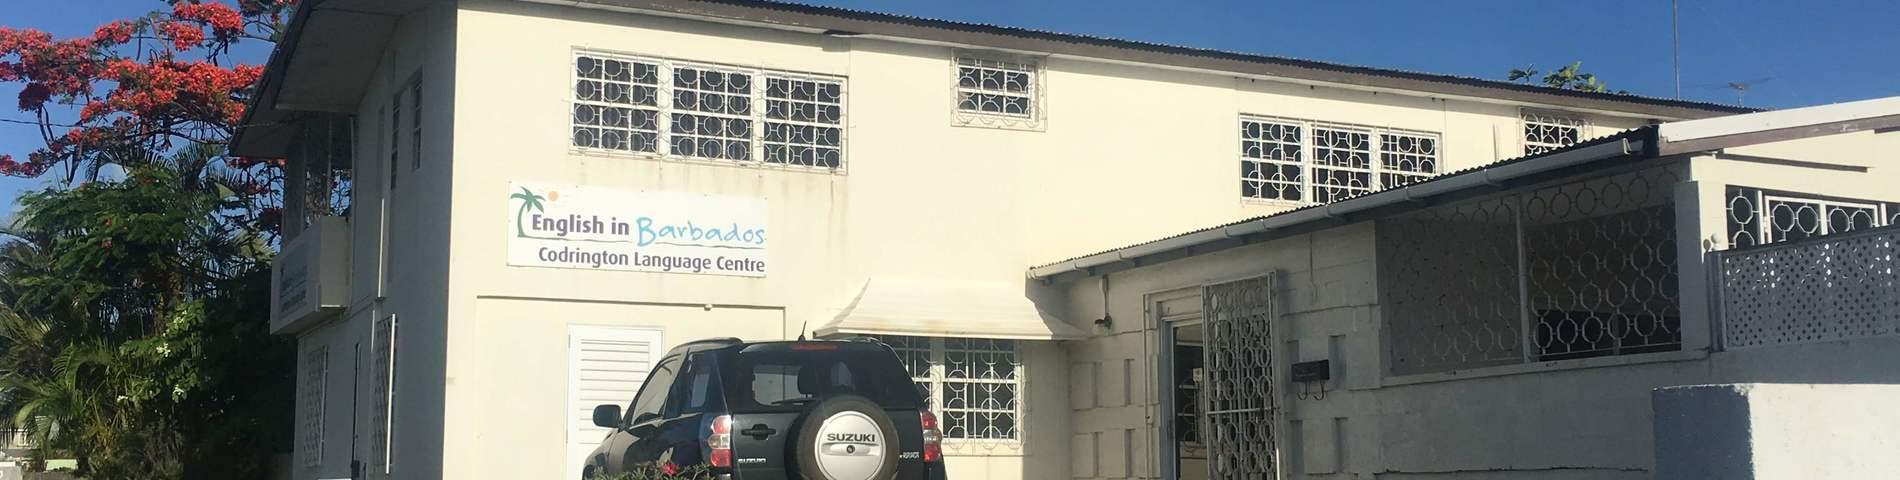 The Codrington Language Centre obrazek 1